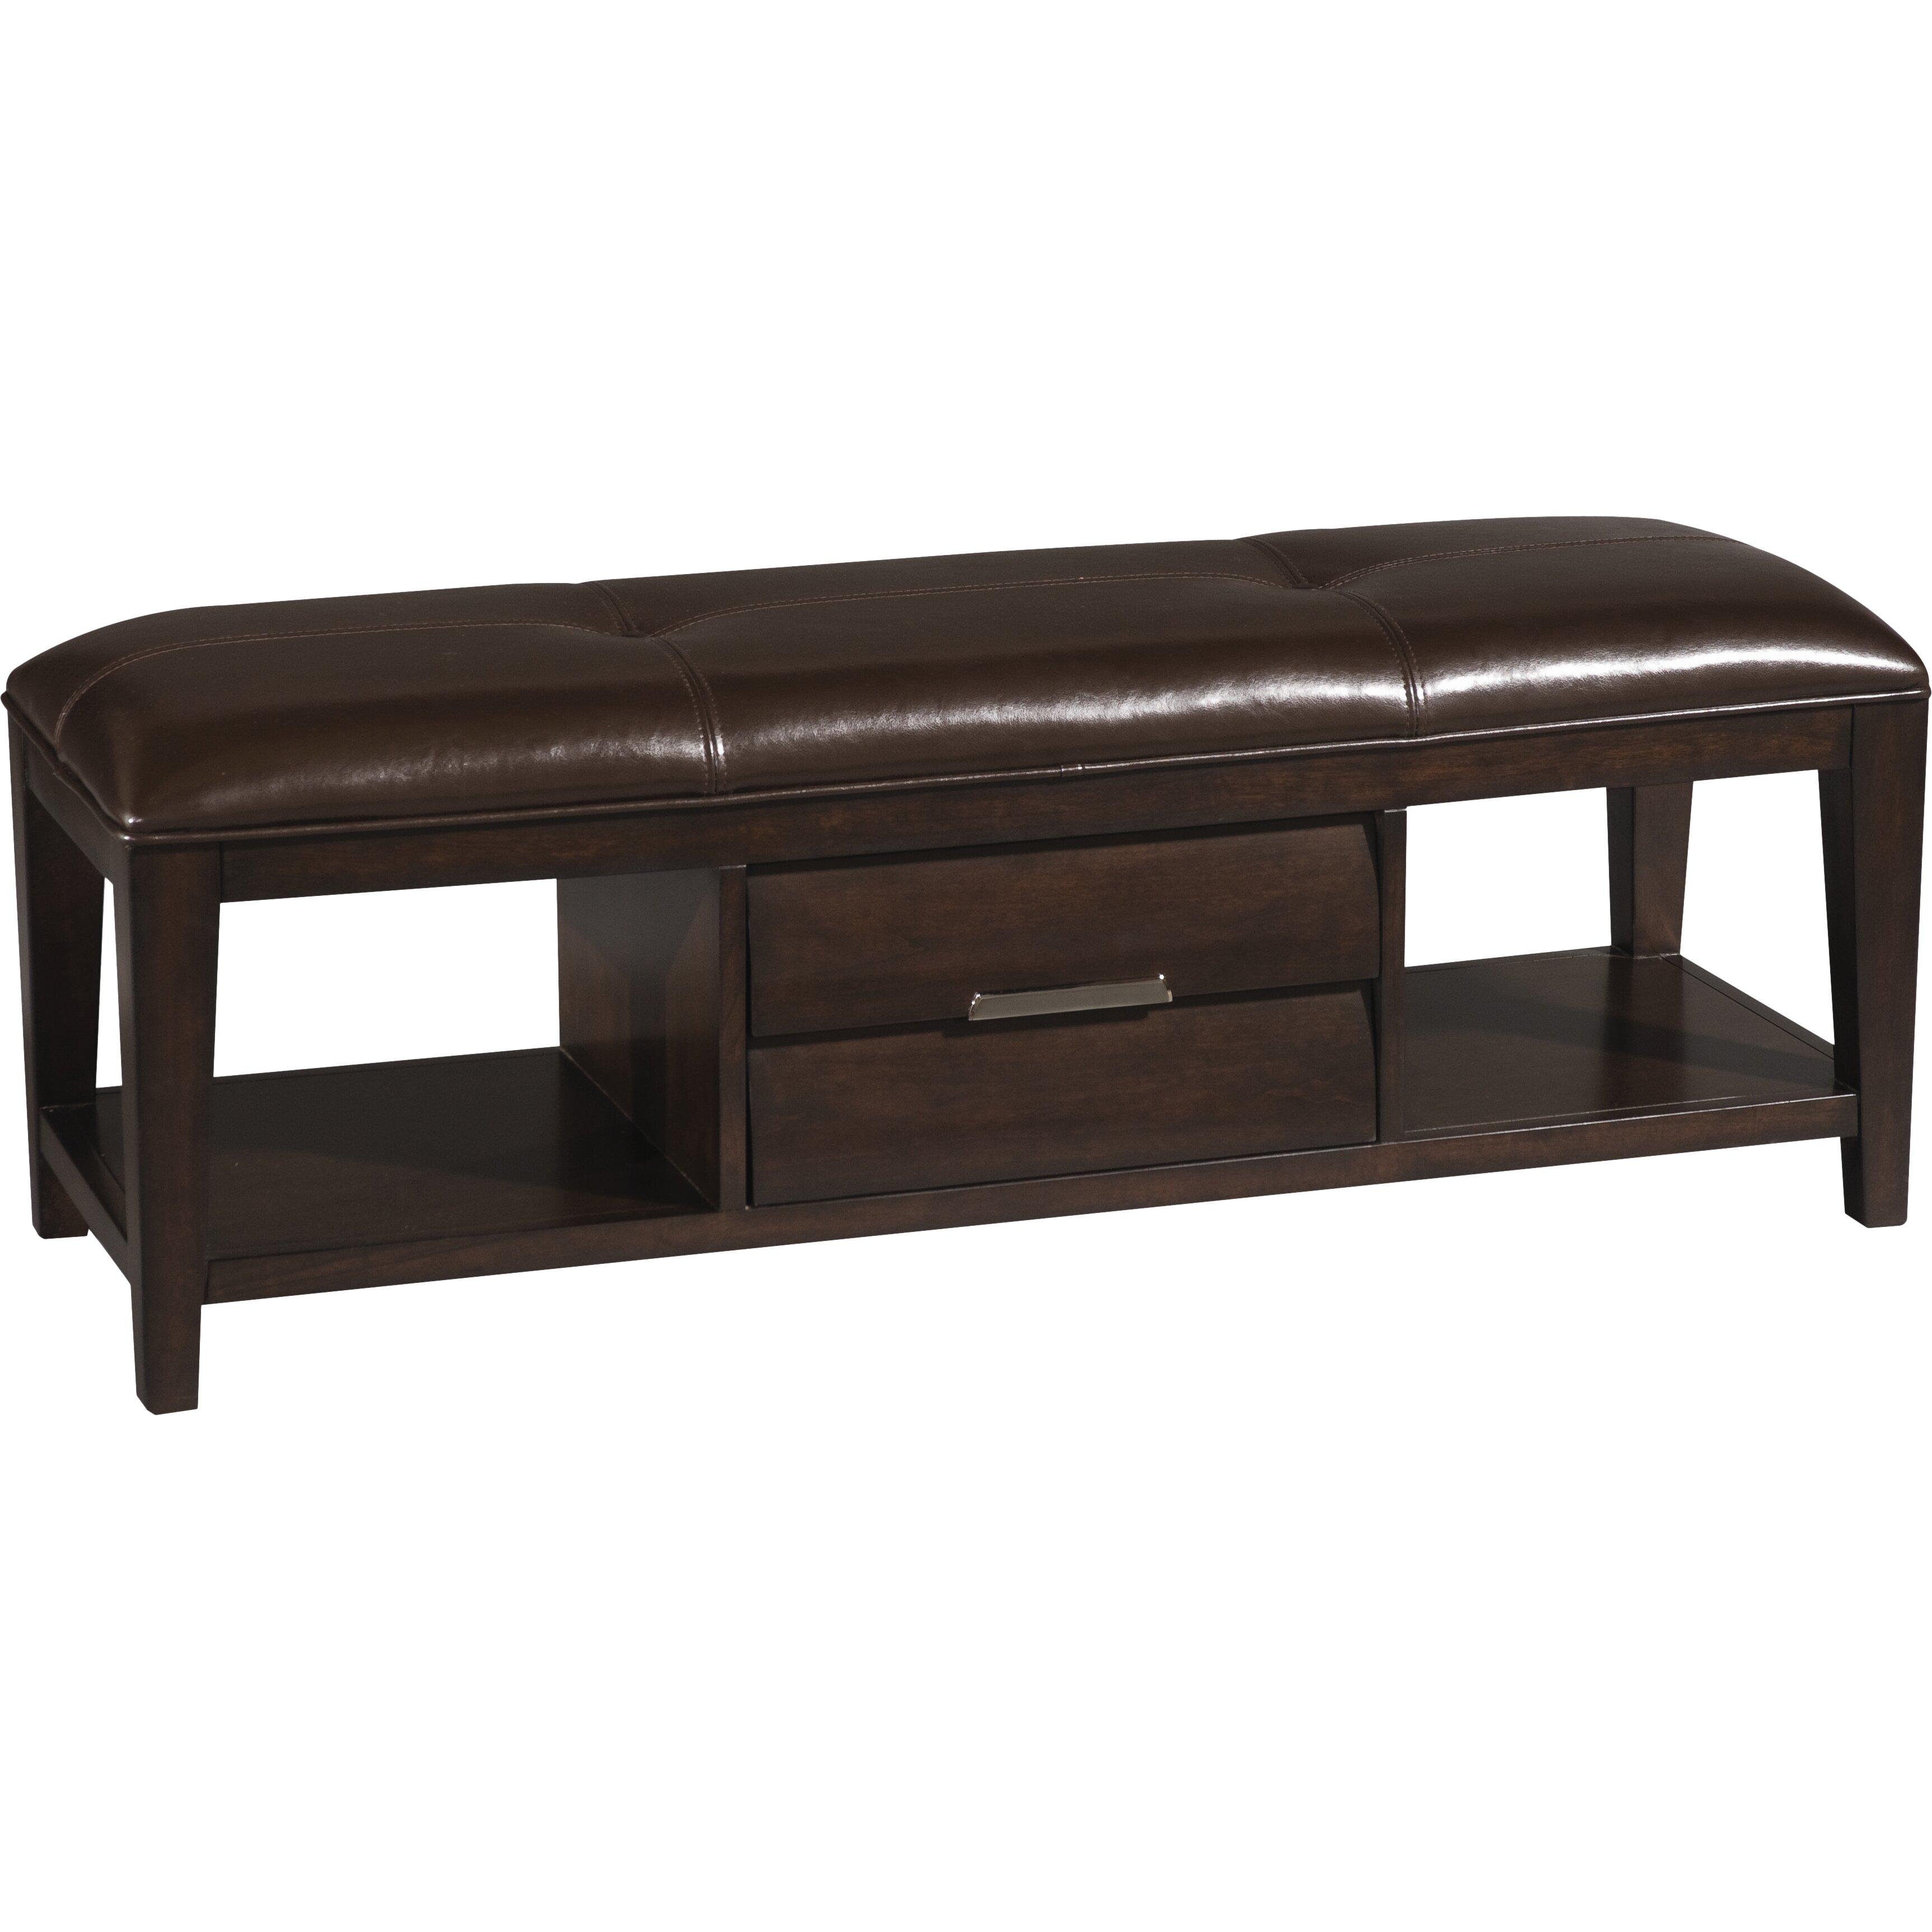 Pulaski Tangerine 330 Panel Customizable Bedroom Set Reviews Wayfair